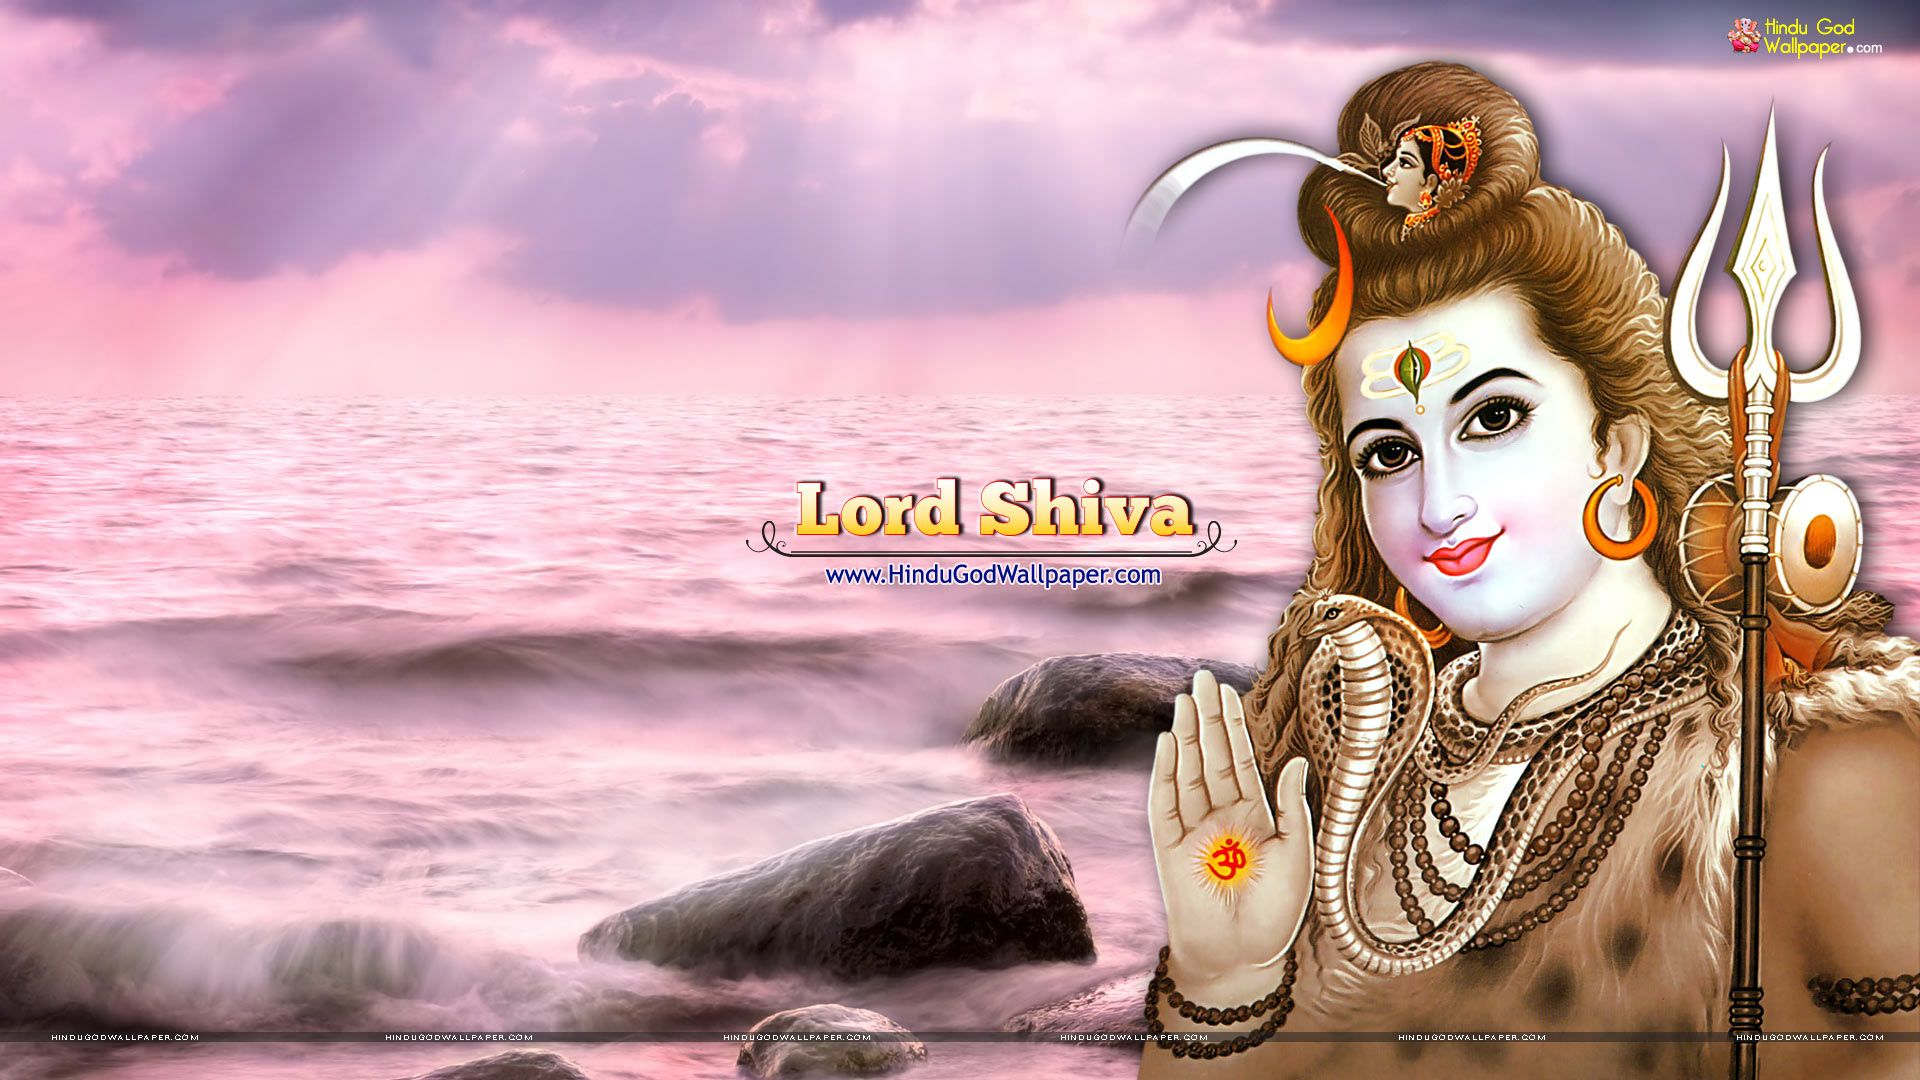 Lord Shiva HD Wallpaper Widescreen 1080p Download | Shiva ...